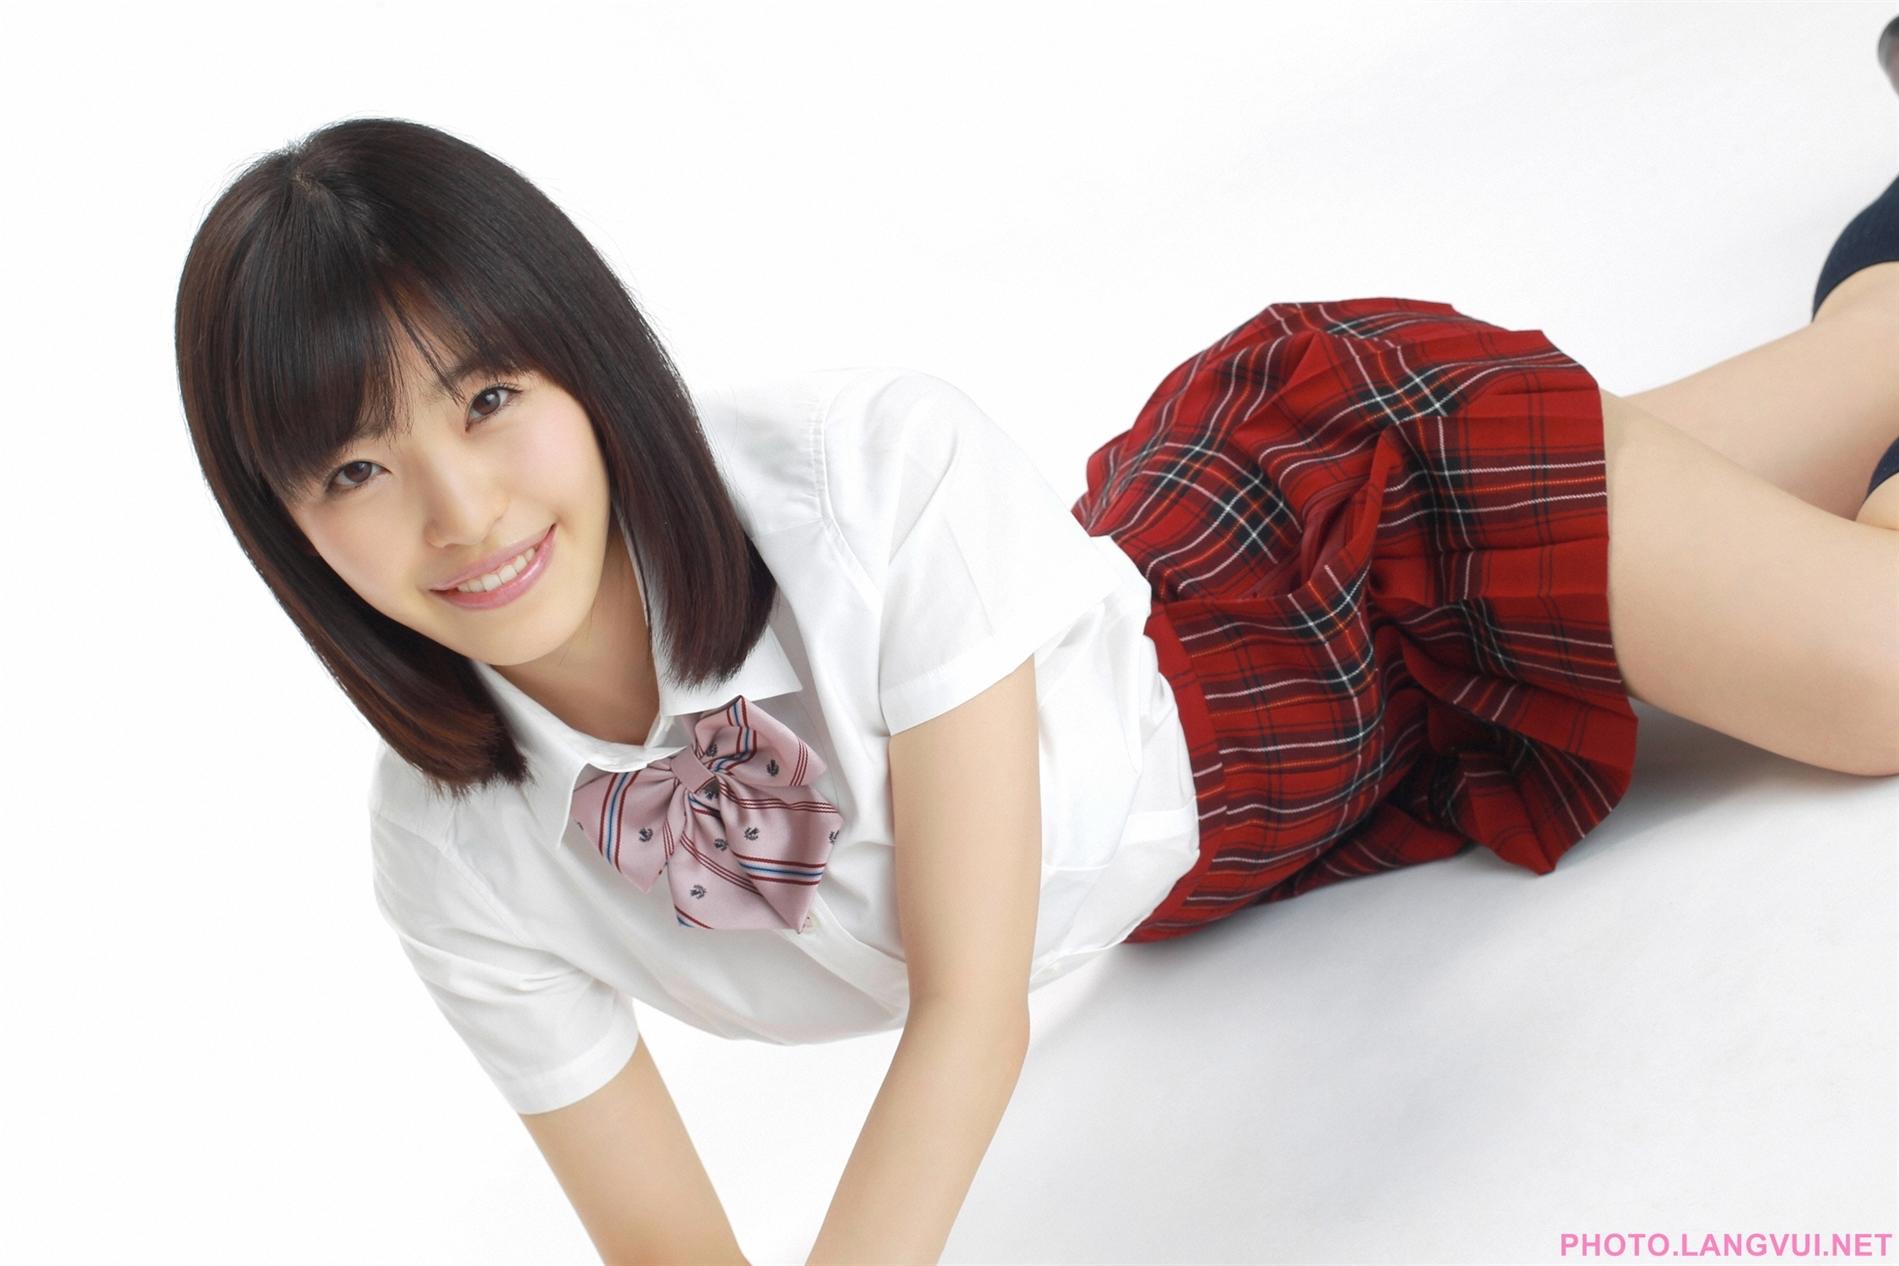 YS Web Vol 566 Hatsuho Tani - Page 3 of 10 - Ảnh Girl Xinh